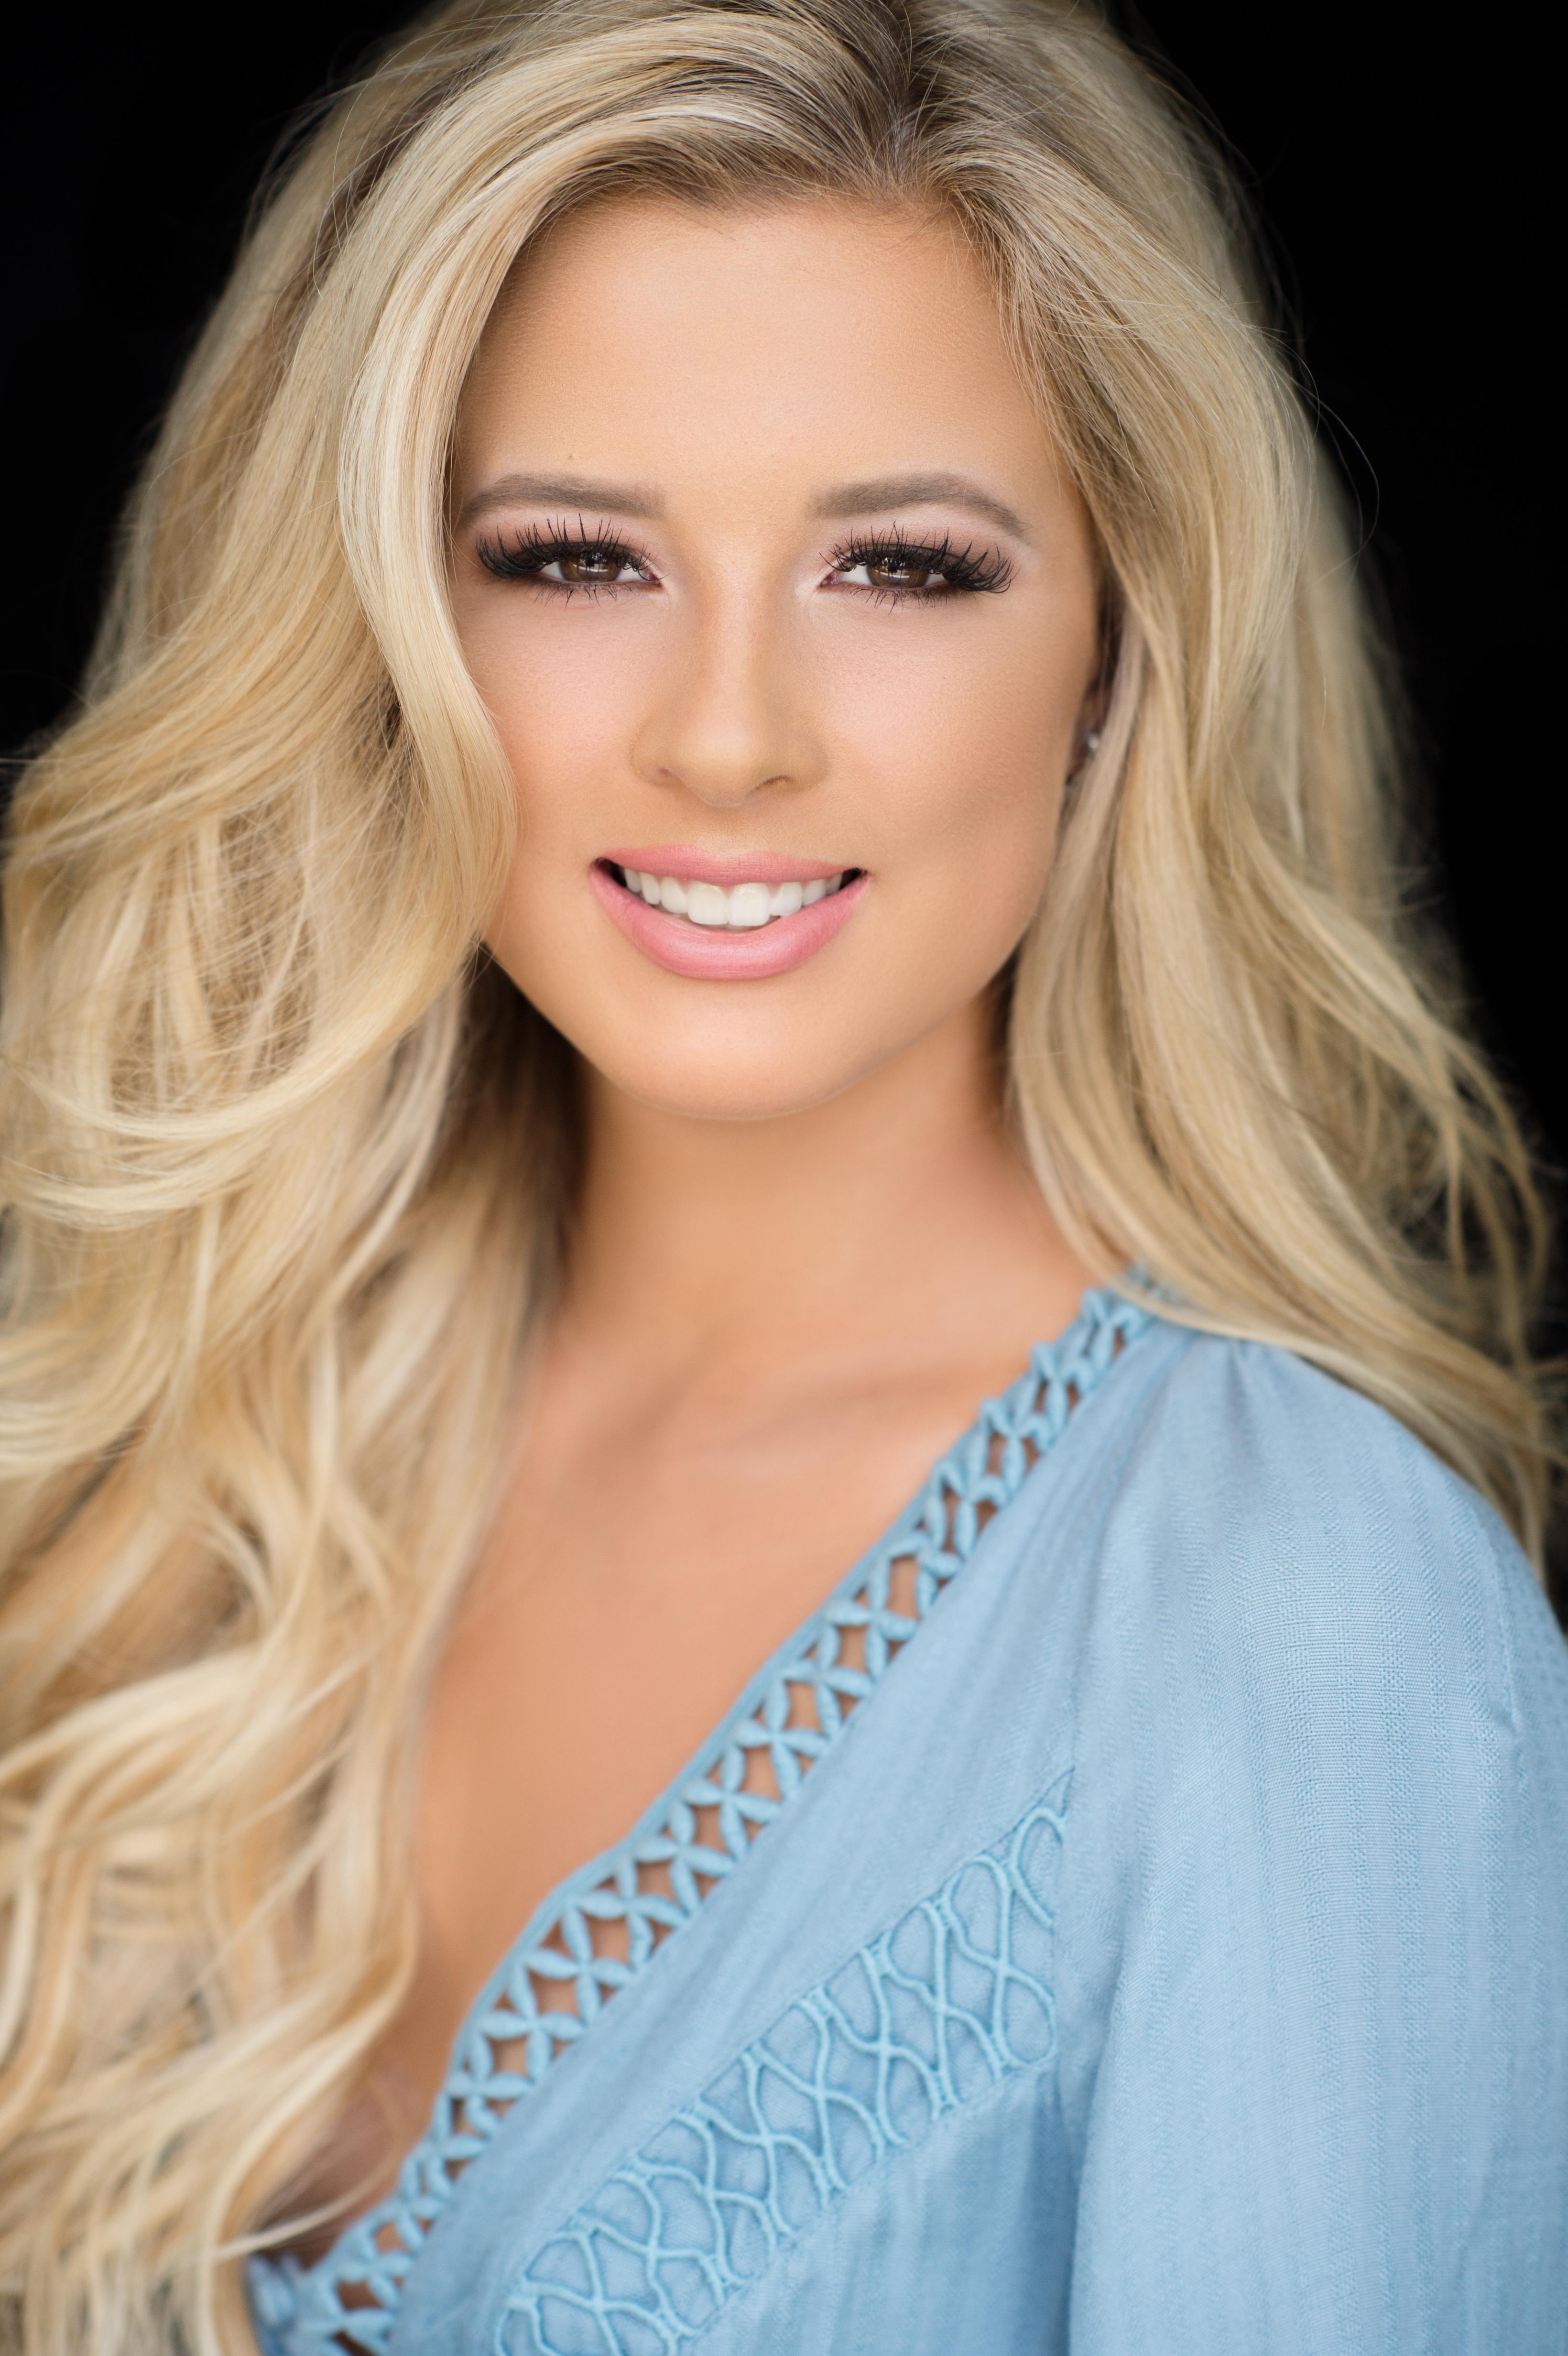 2017 TEEN CONTESTANTS   Miss Virginia USA Photos   Miss Virginia USA ...